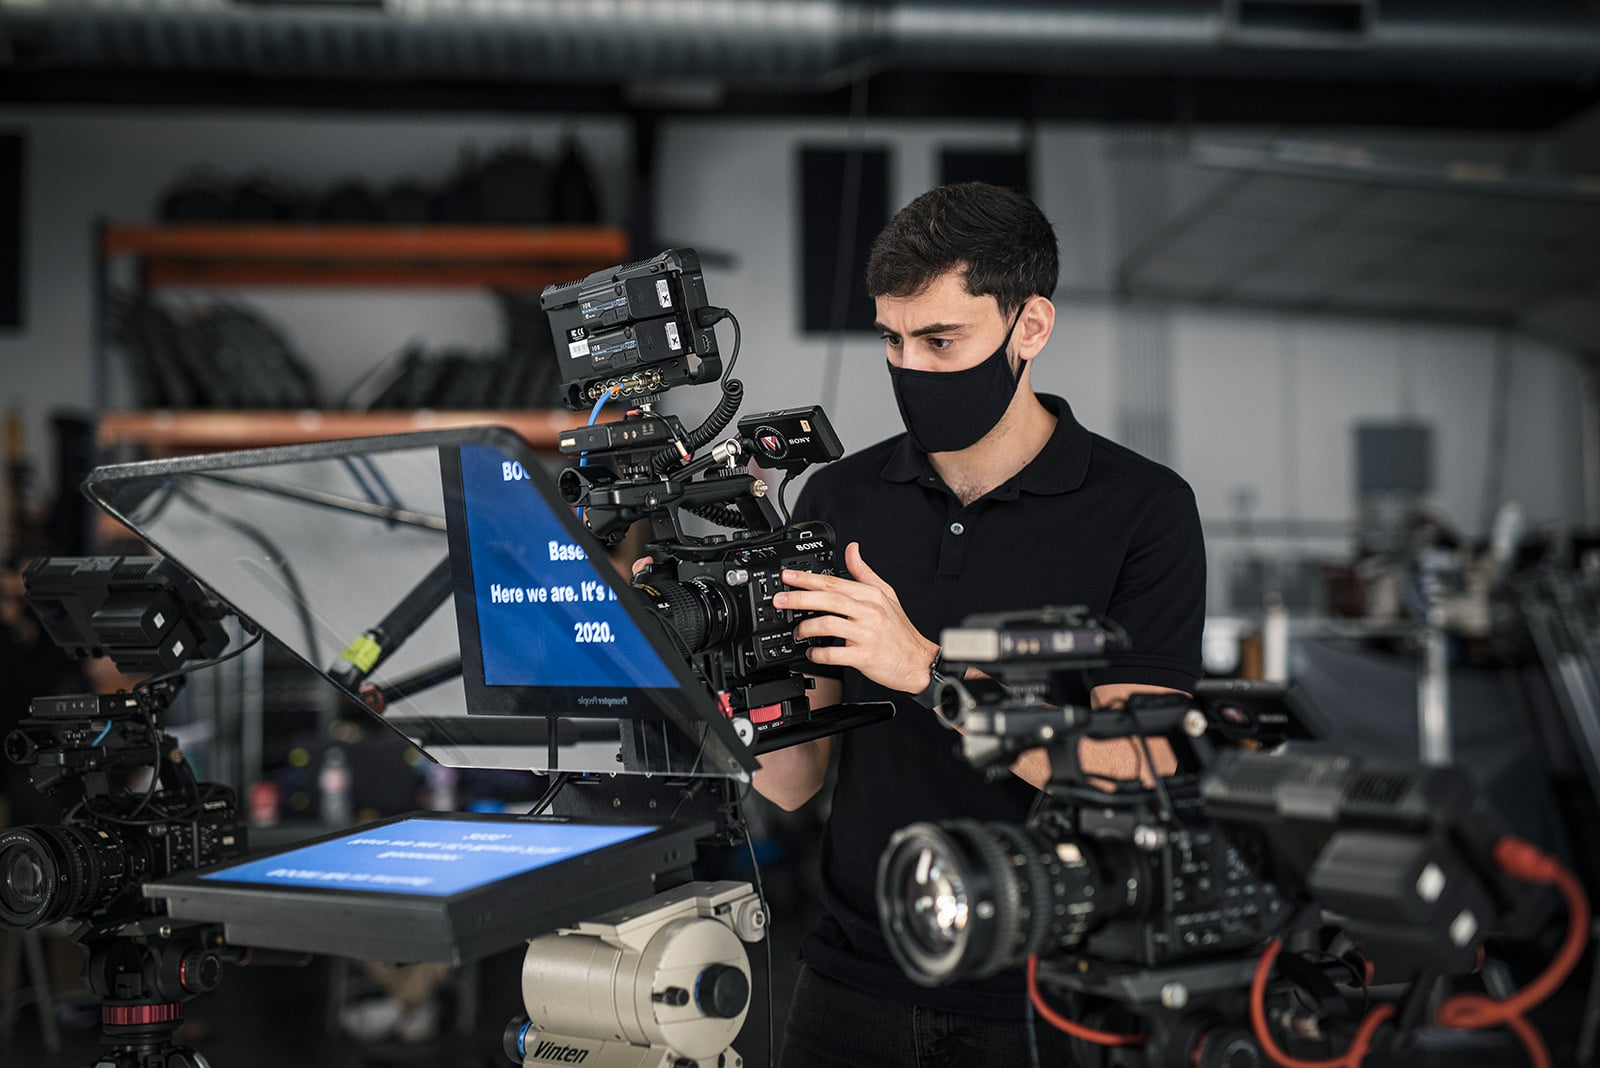 Delorean Shoot - Studio Video Production Florida